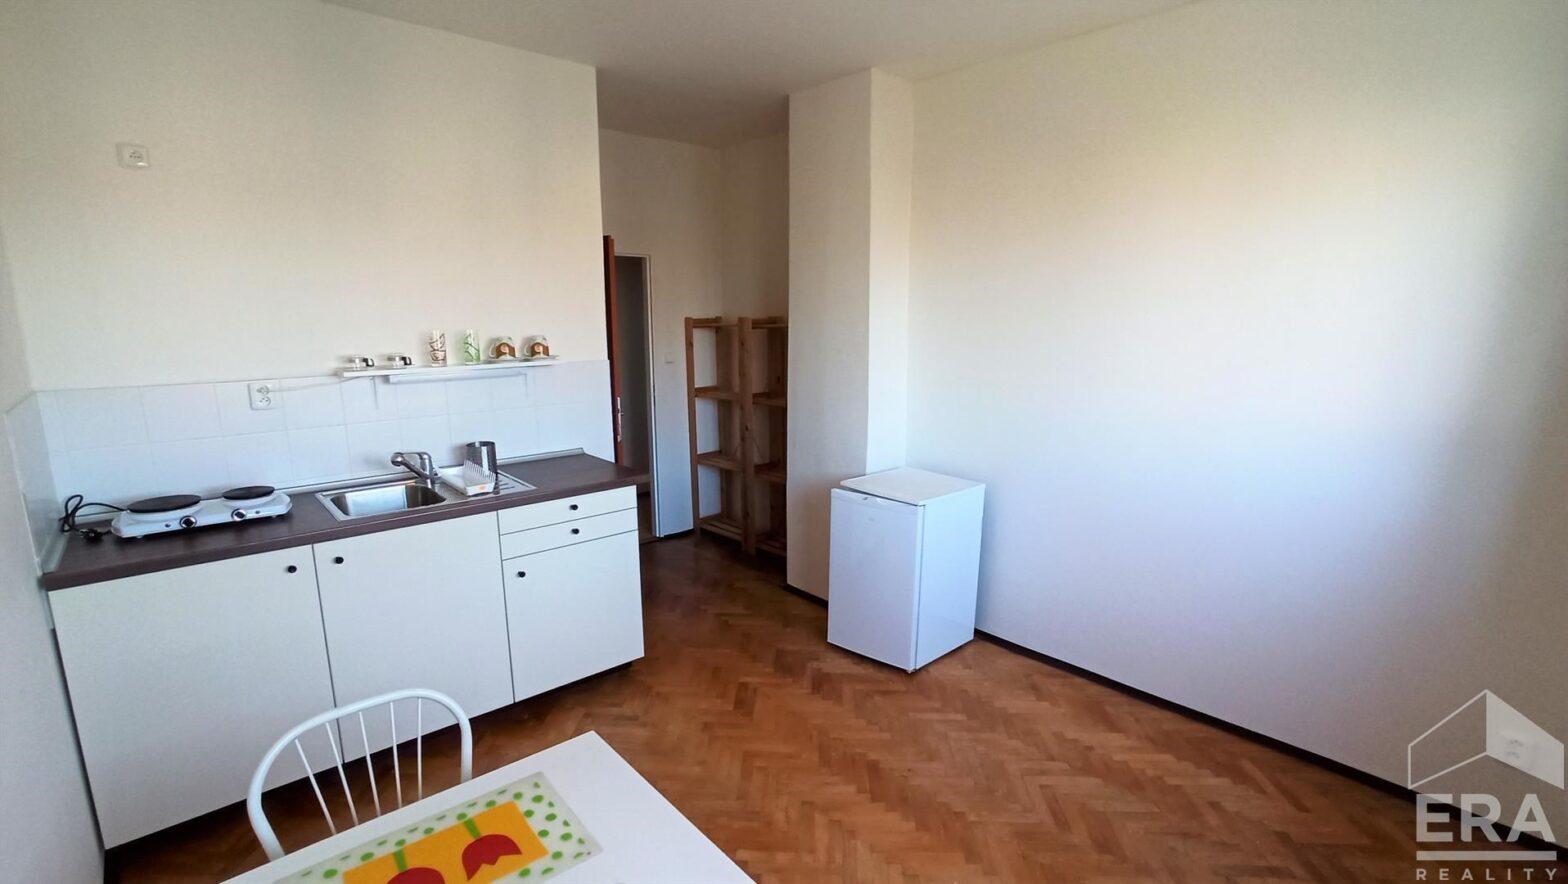 Pěkný byt o dispozici 1+1